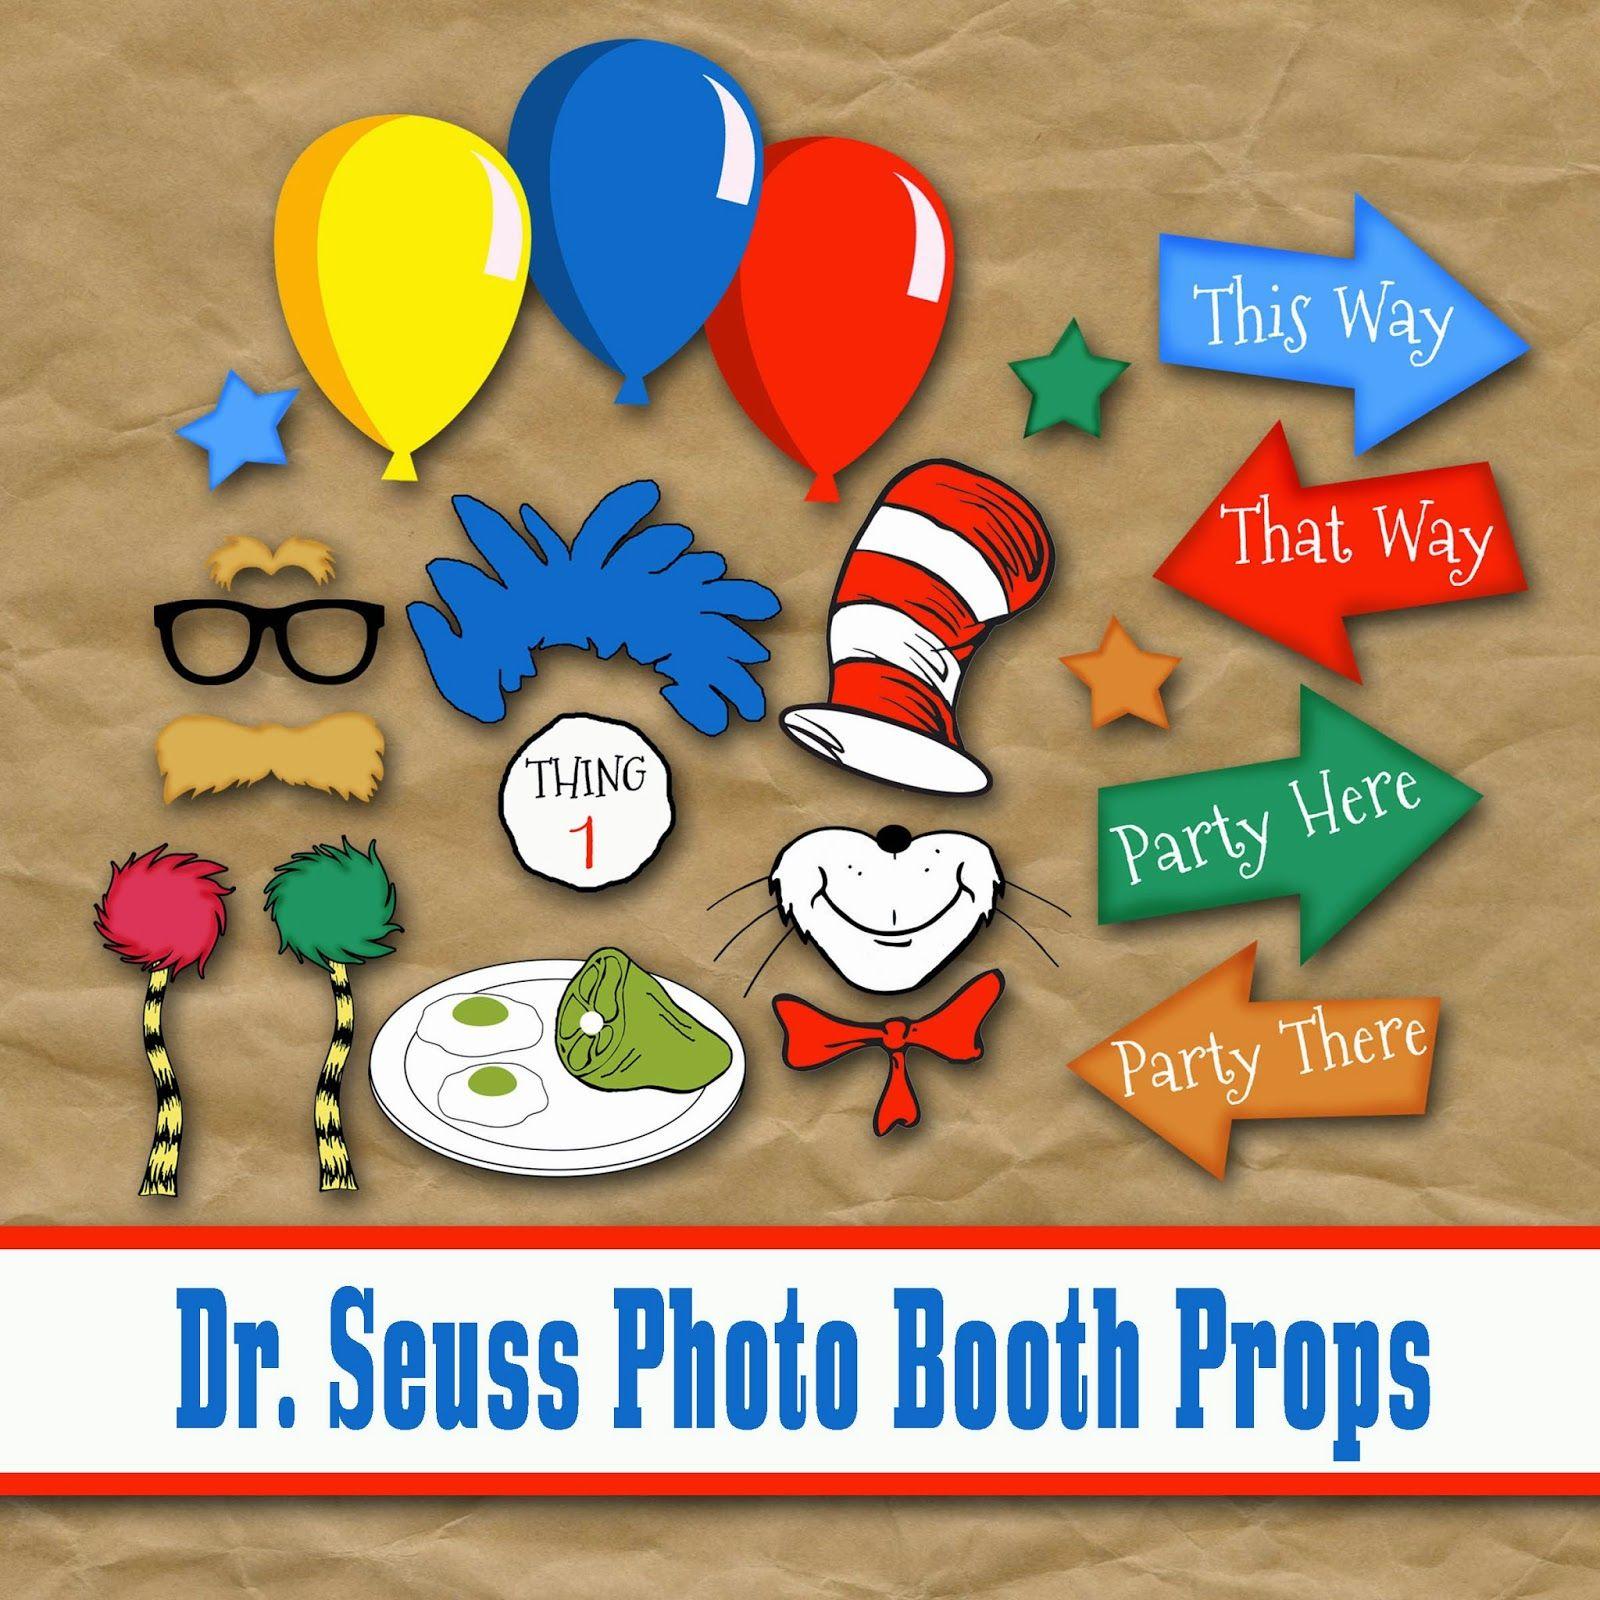 Dr Seuss Photo Booth Printable Props Dr Seuss Classroom Dr Seuss Birthday Party Dr Seuss Activities